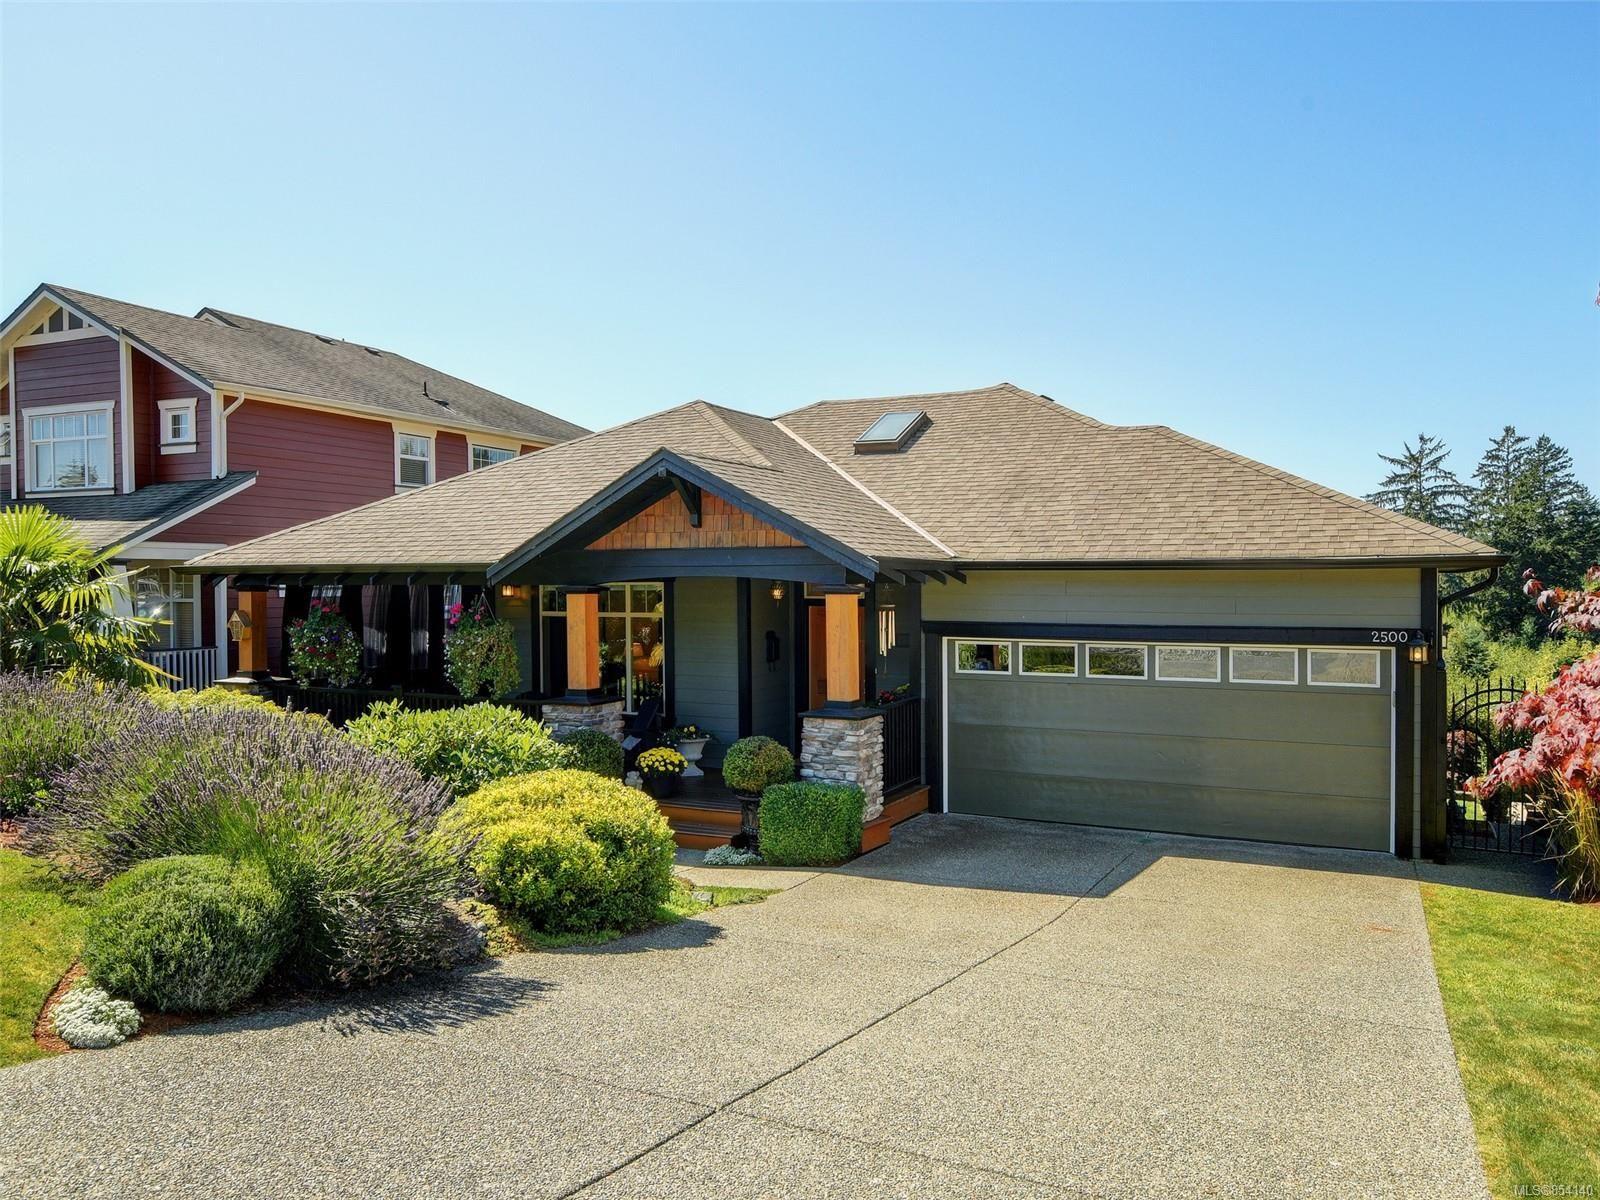 Main Photo: 2500 Westview Terr in : Sk Sunriver House for sale (Sooke)  : MLS®# 854140